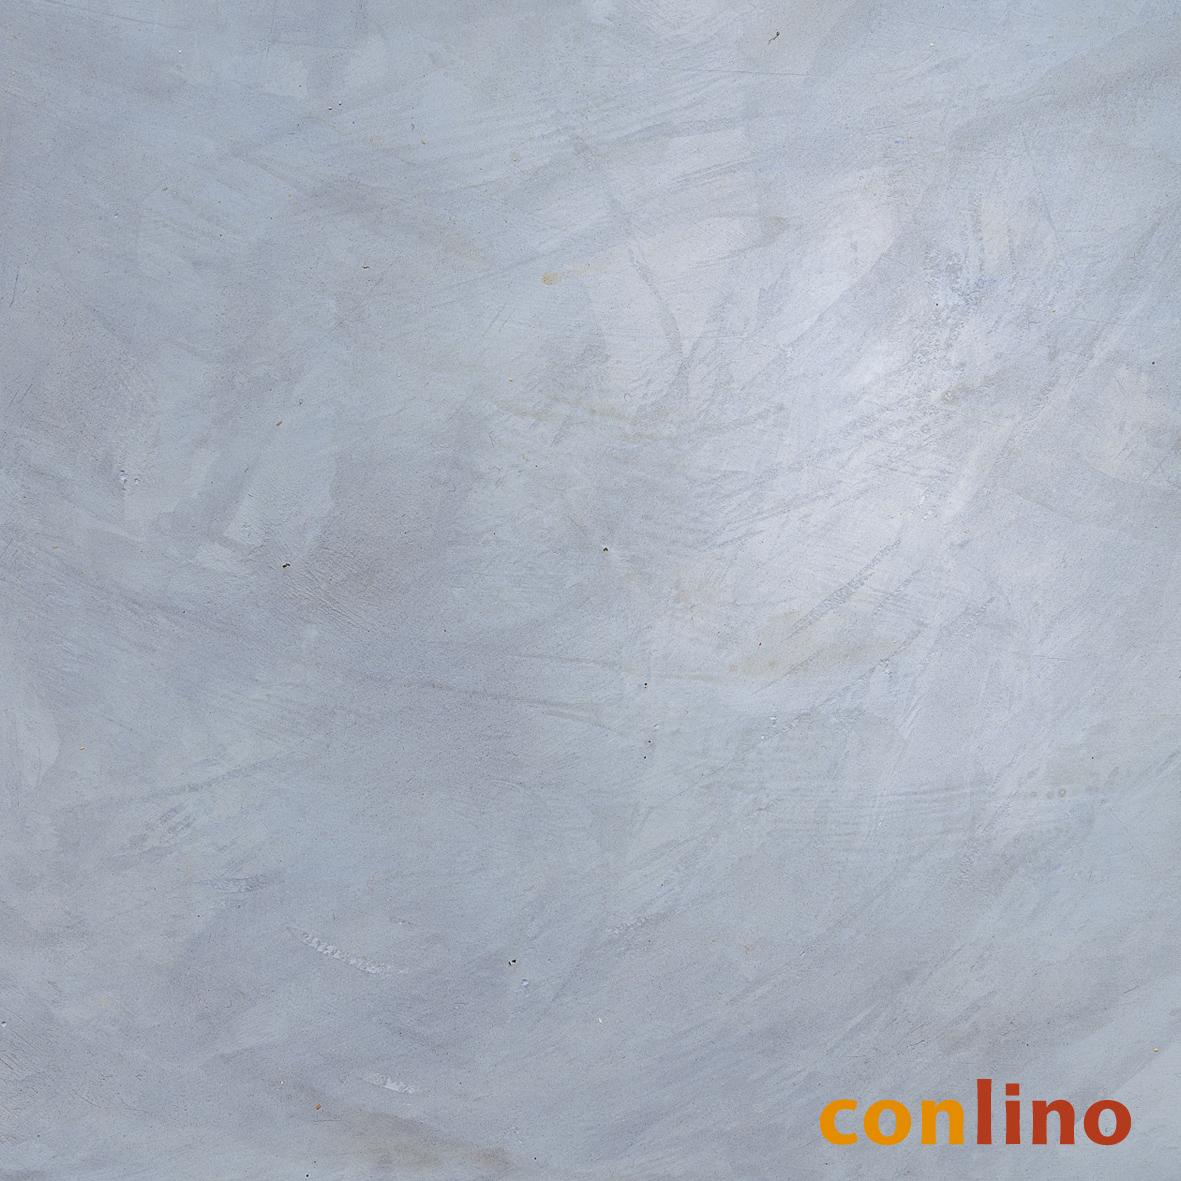 conluto Lehm-Glätte Lehmblau CG 131